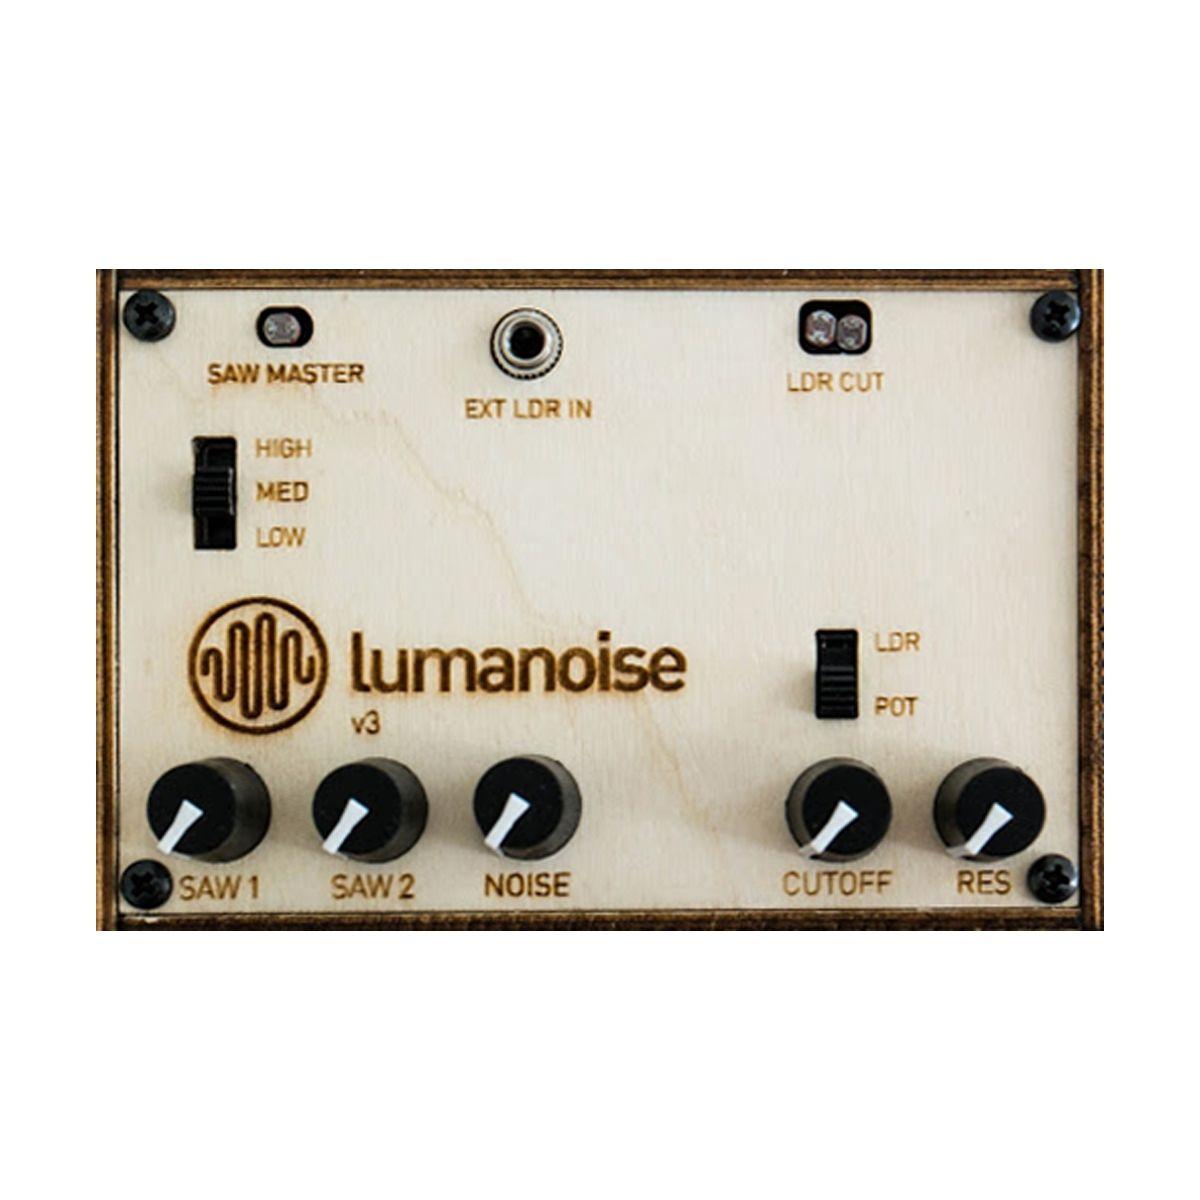 LEP Lumanoise V3 Desktop Chord/Drone Synth